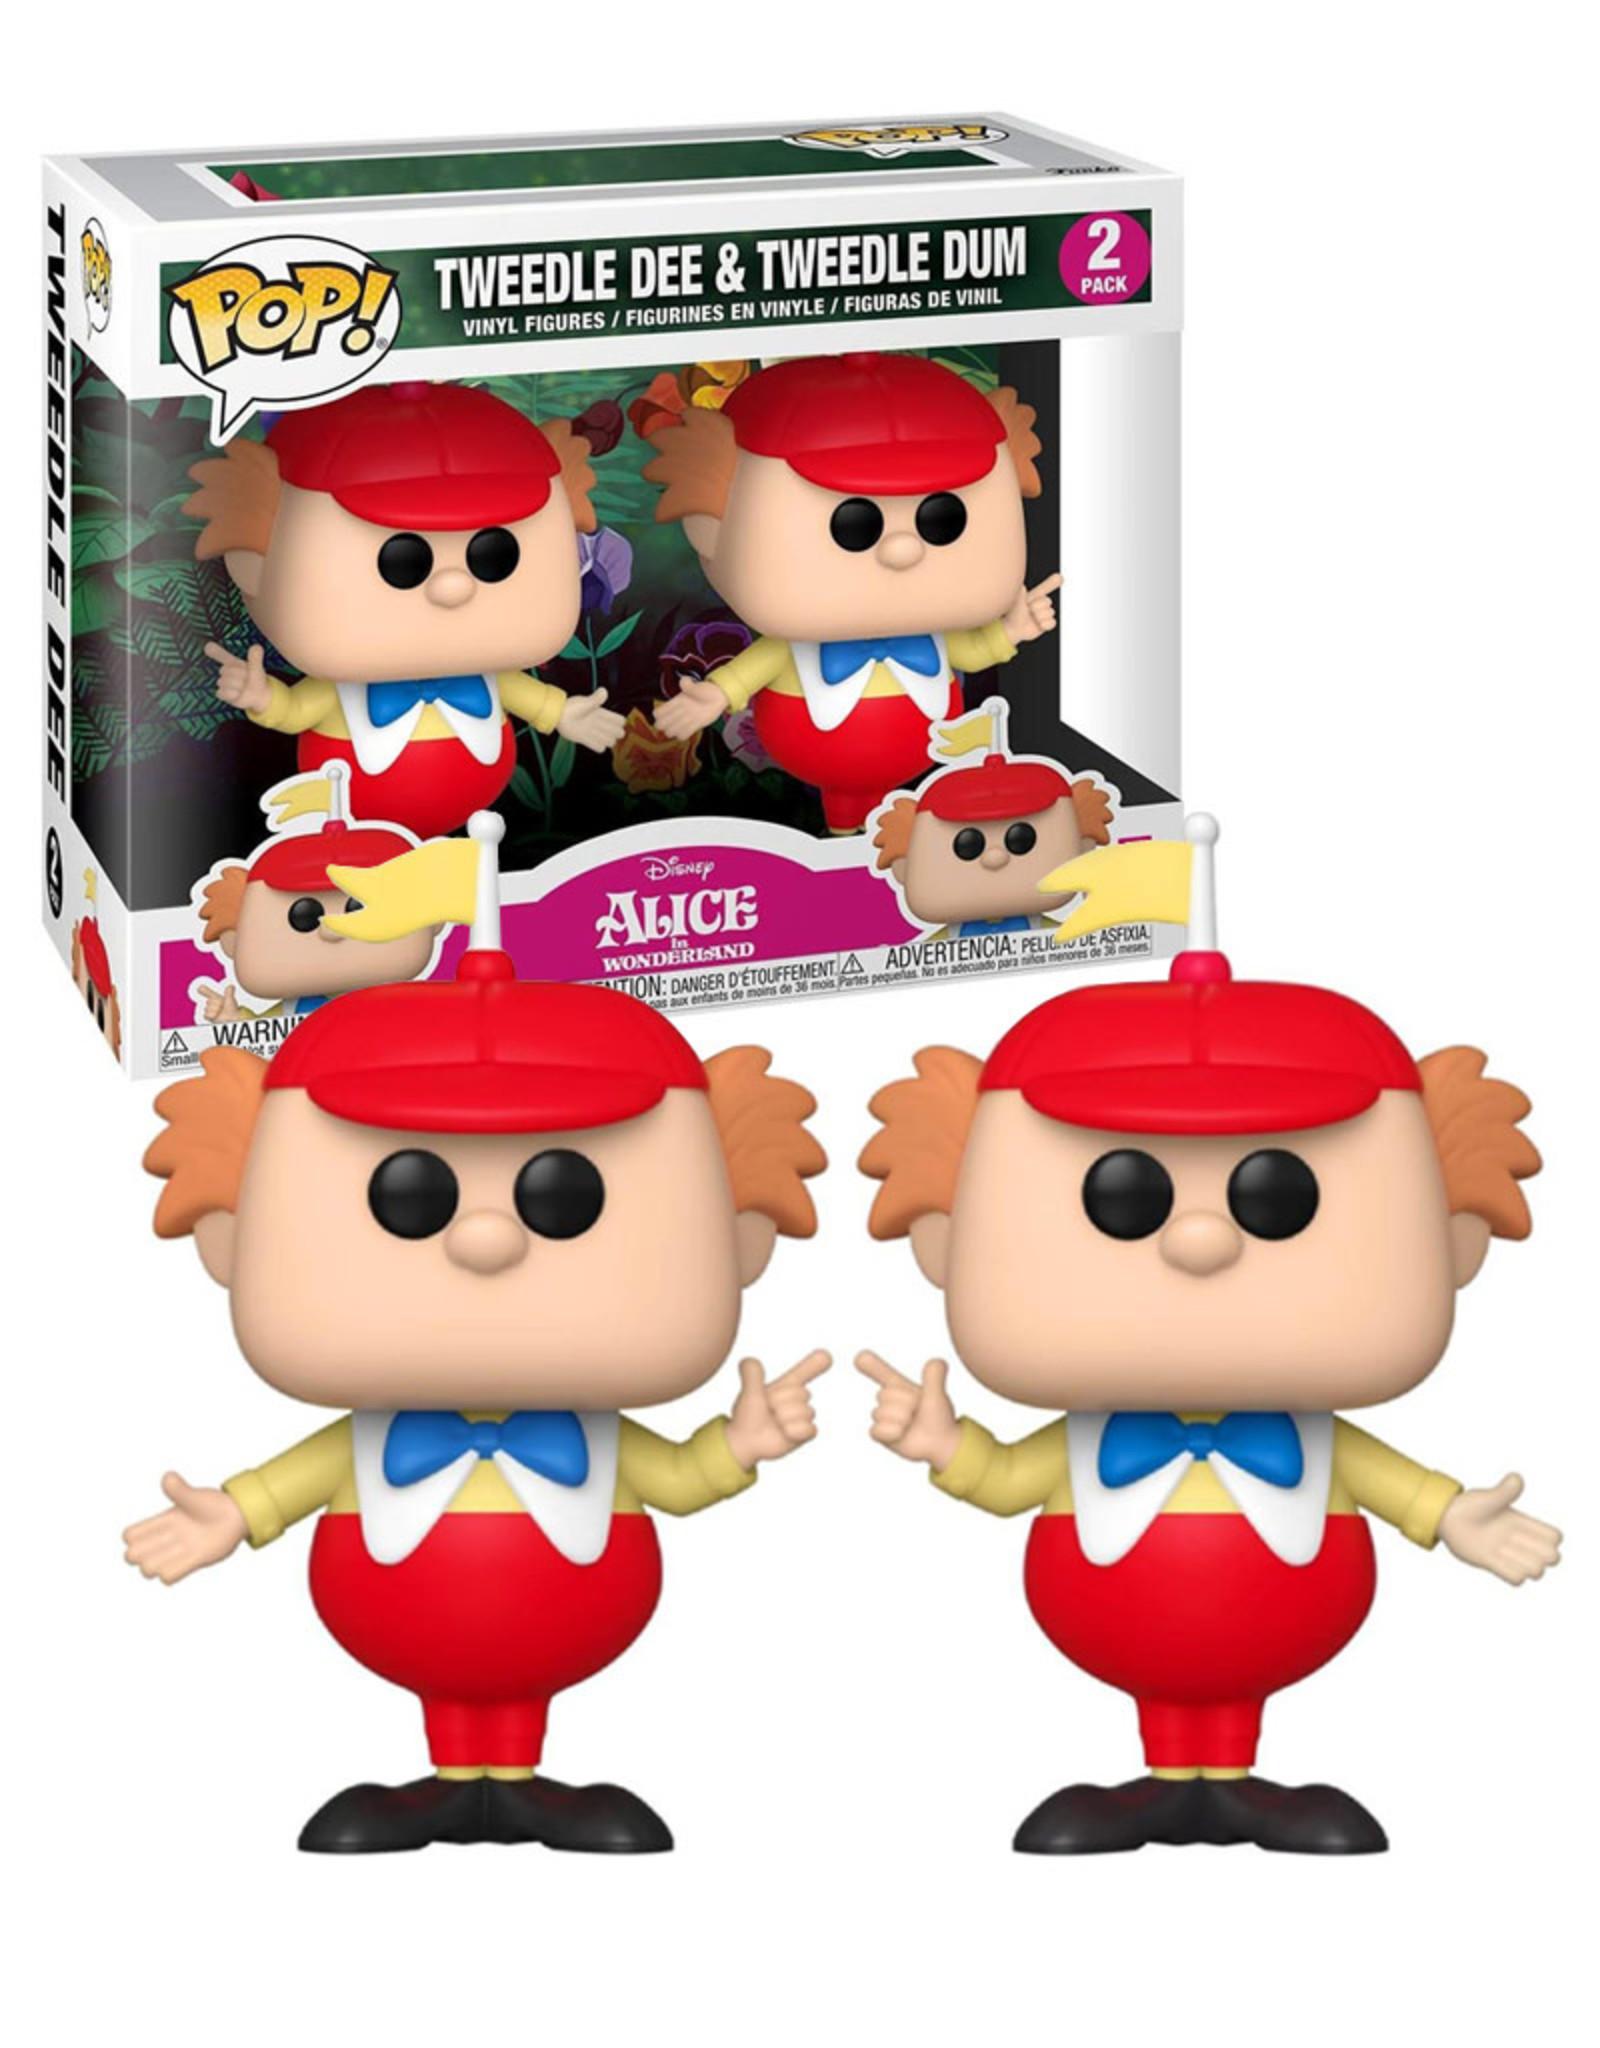 Disney Alice in Wonderland 2 Pack ( Funko Pop ) Tweedle Dee & Tweedle Dum